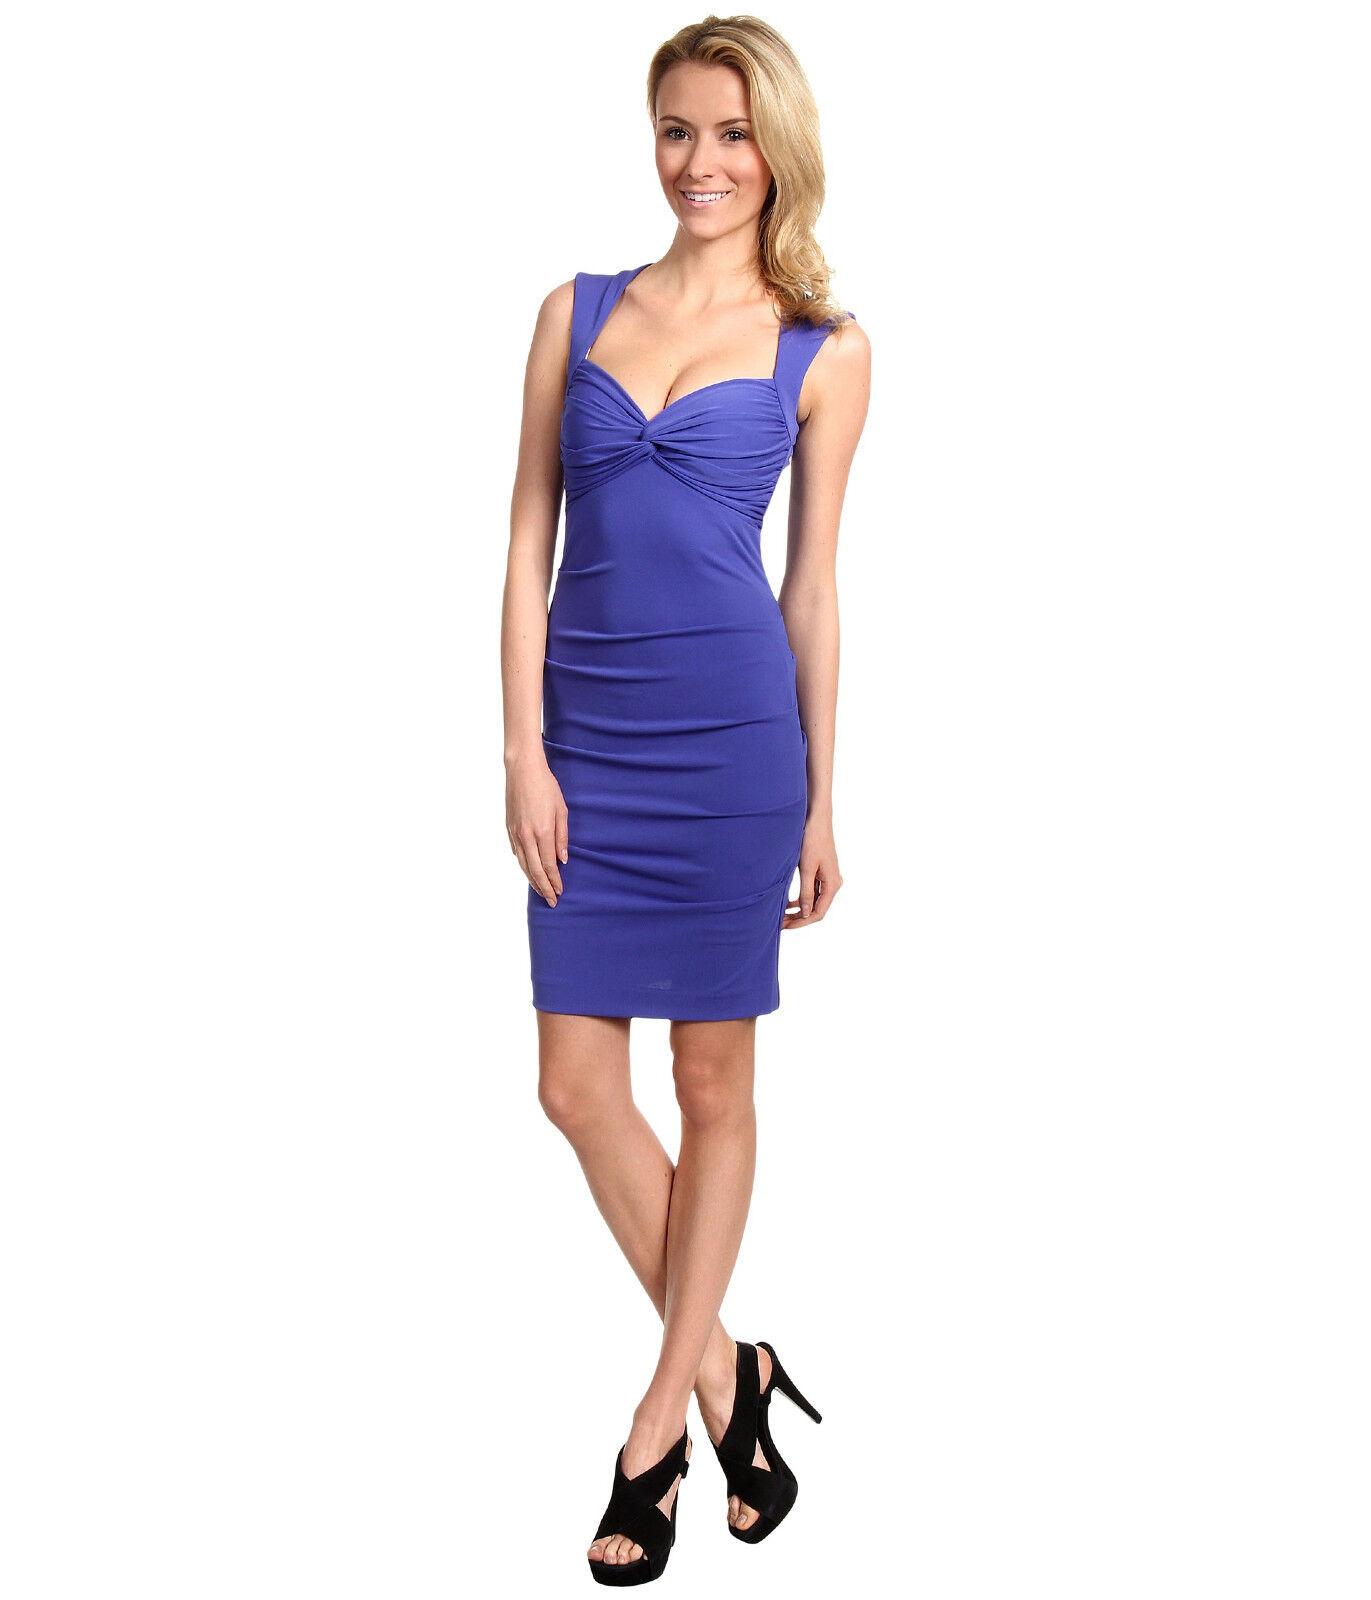 Nicole Miller Felicia Open Back Sheath Dress Sz 4 Cobalt (lila) New